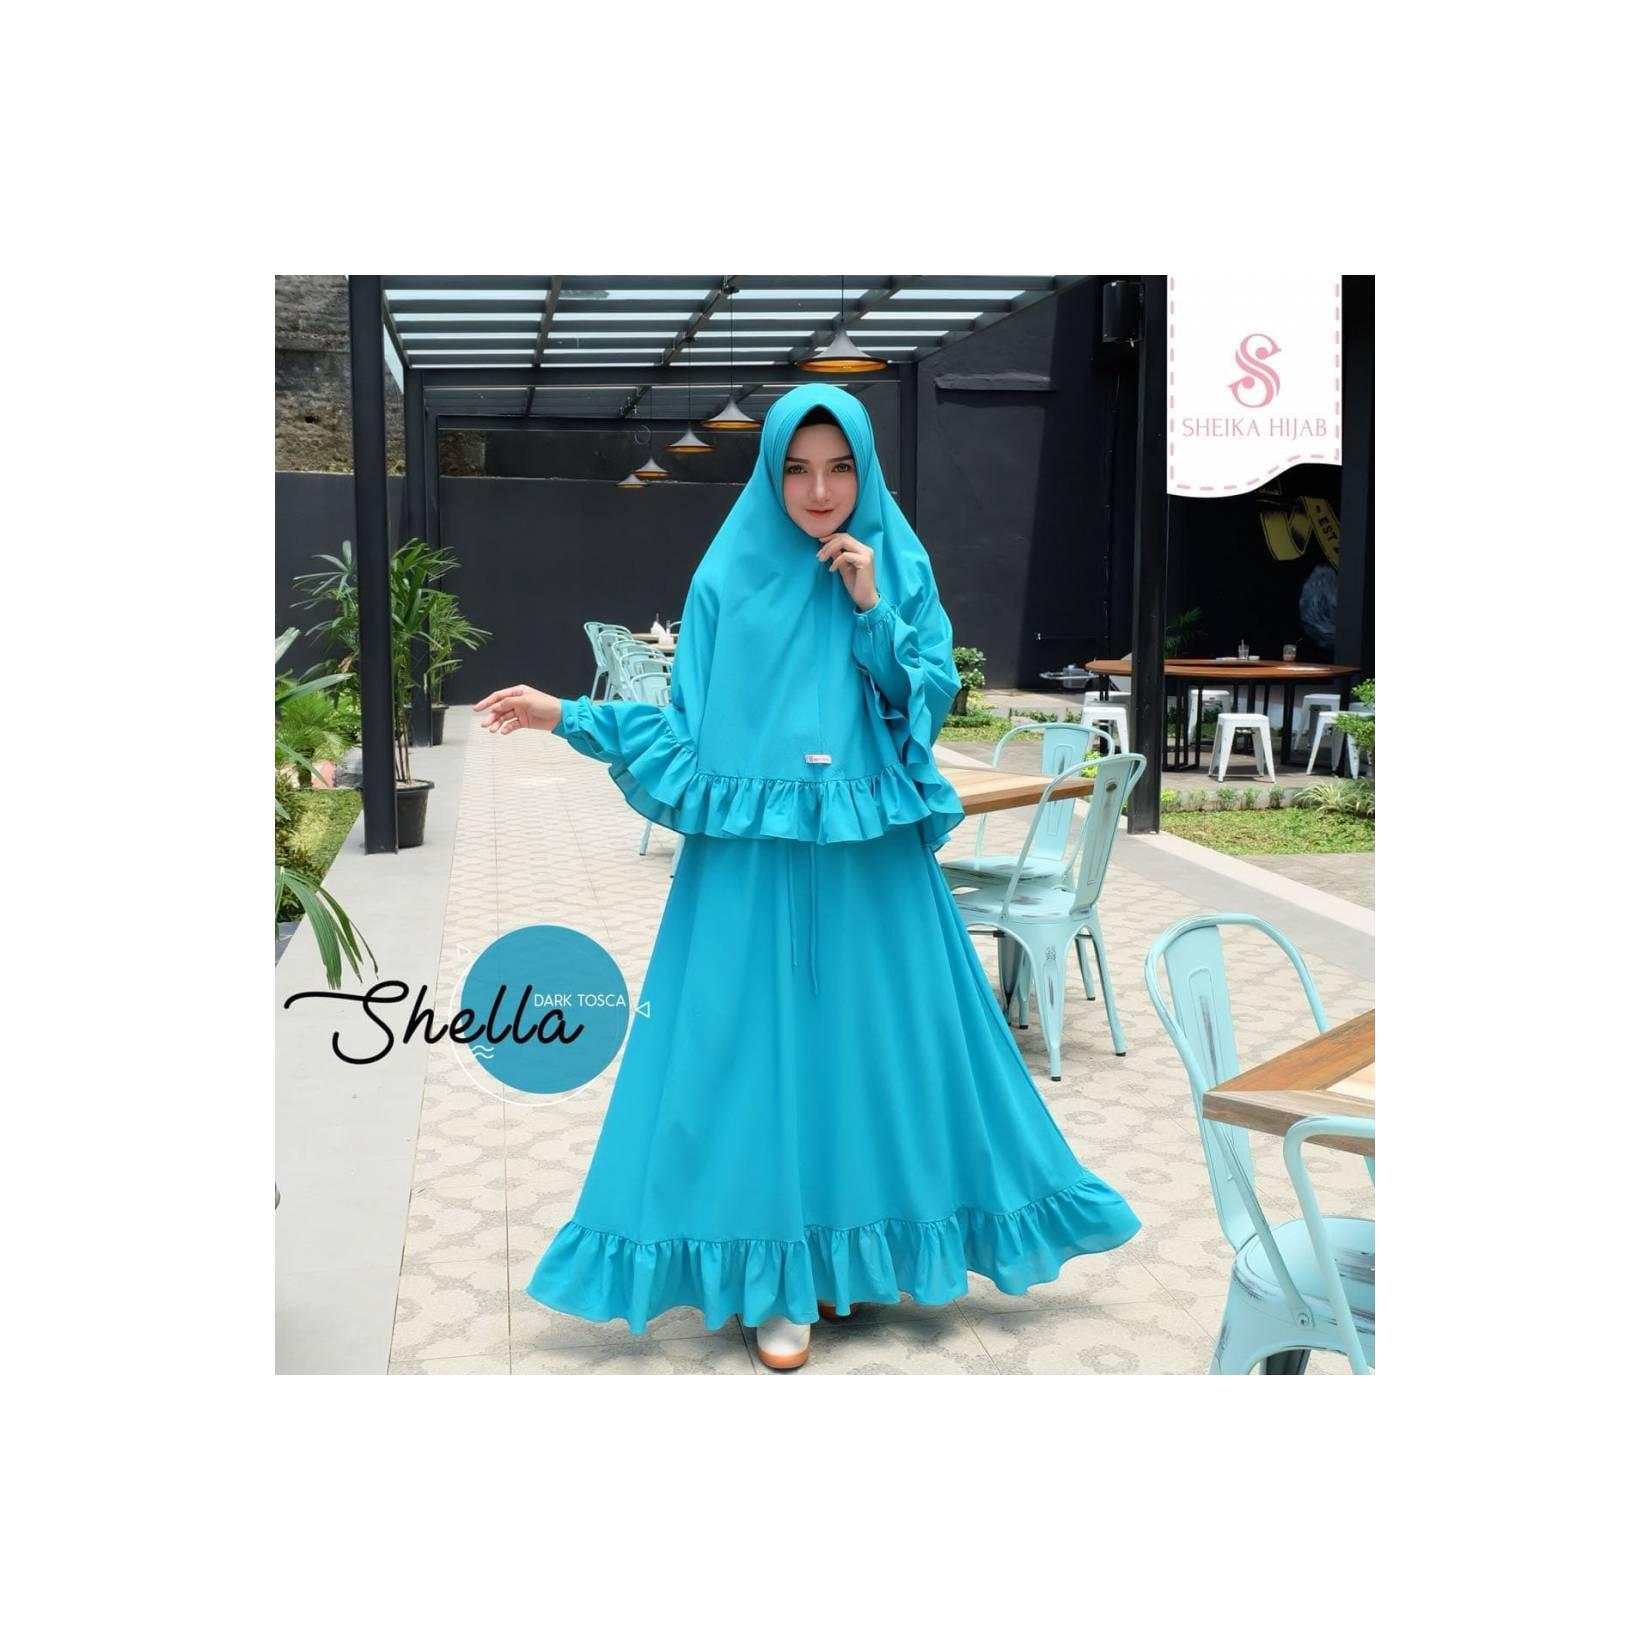 PROMO ORIGINAL TERBARU Gamis Sheika Hijab Shella Dress Dark Tosca baj